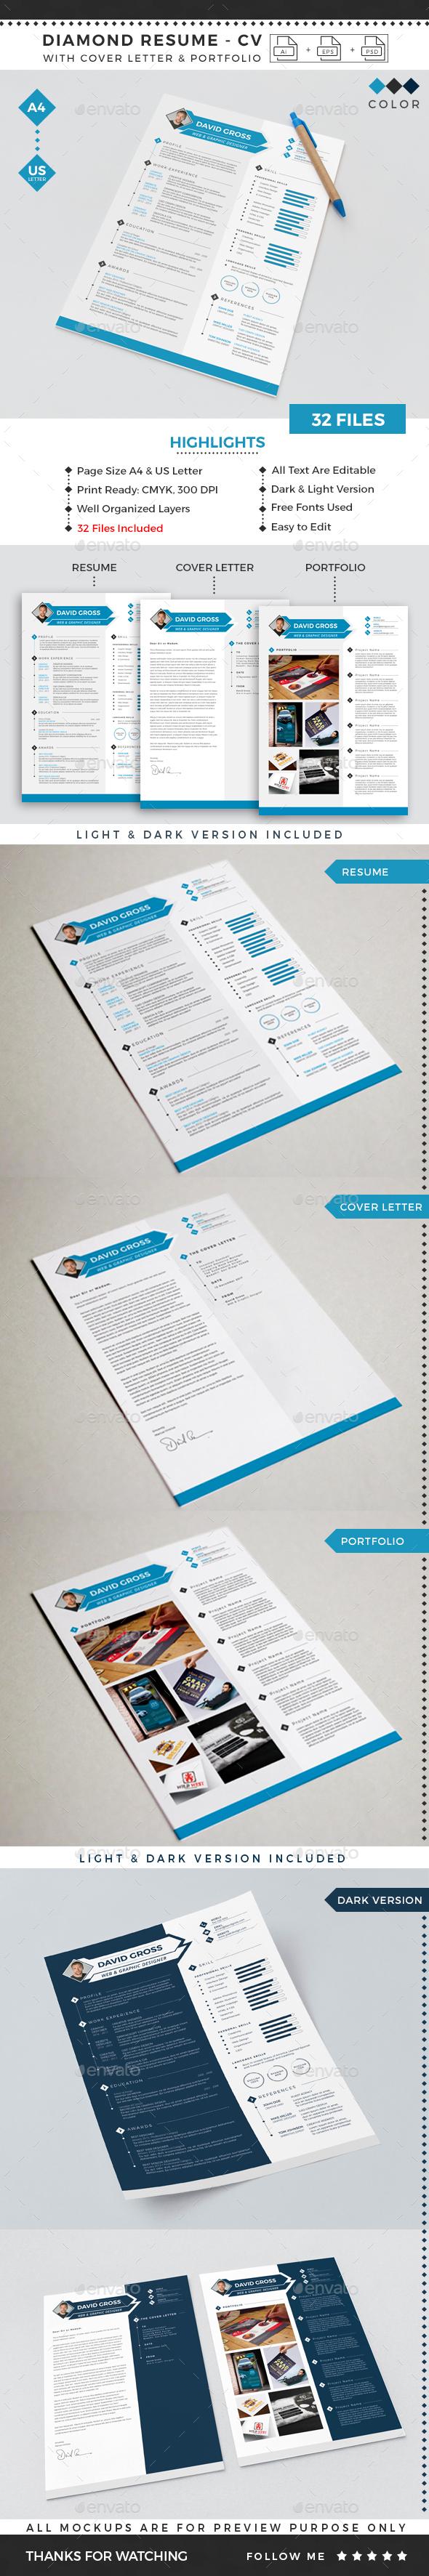 GraphicRiver Diamond Resume CV Template 20777005